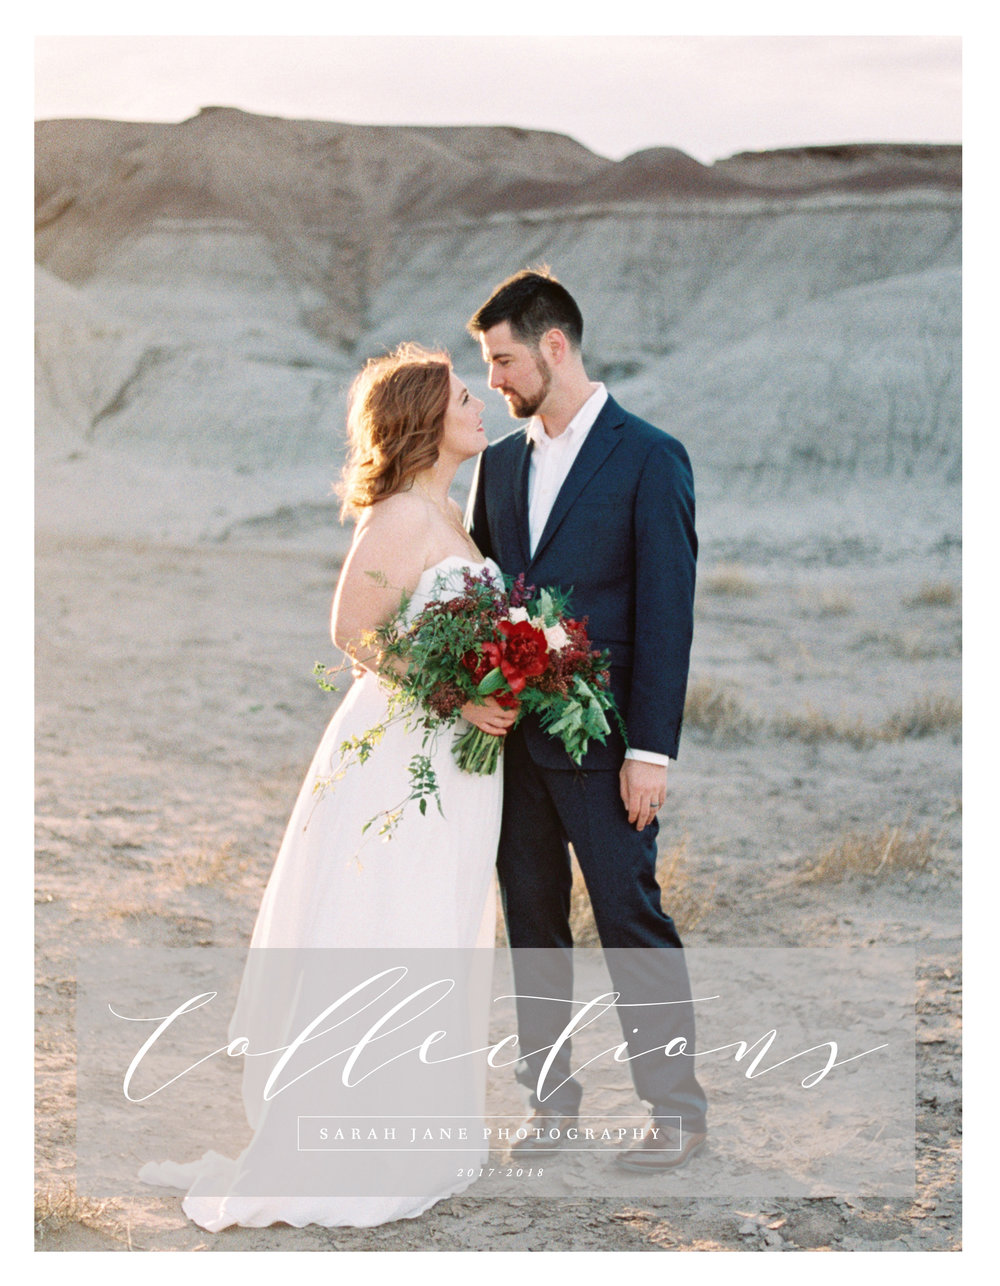 1Sarah Jane Photography Wedding Pricing 2017-2018.jpg